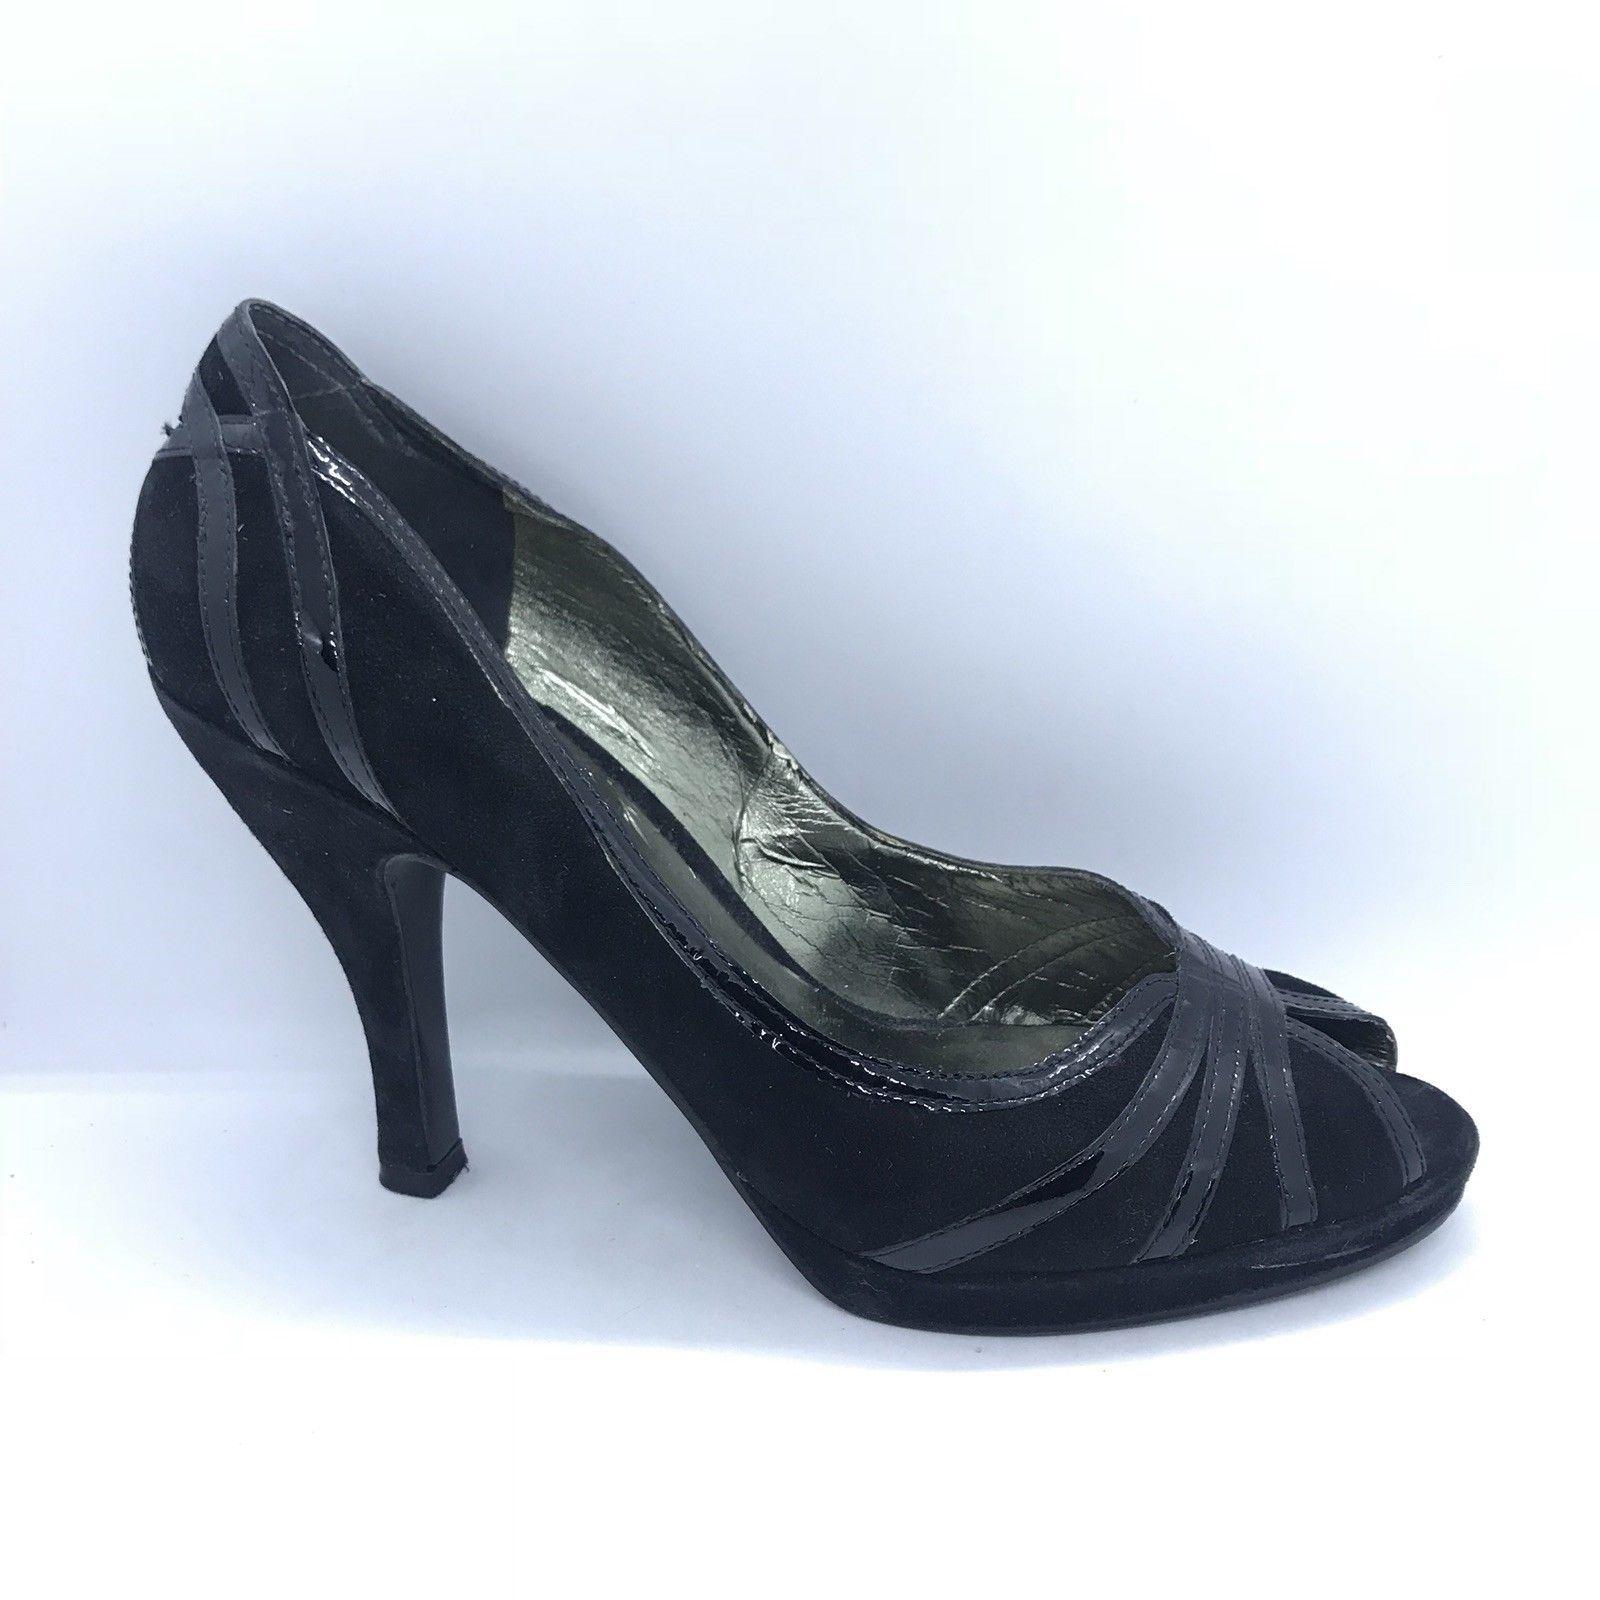 2336e18c21 Enzo Angiolini Peep Toe Heels Women Size 7.5 Black Shoes - $35.00